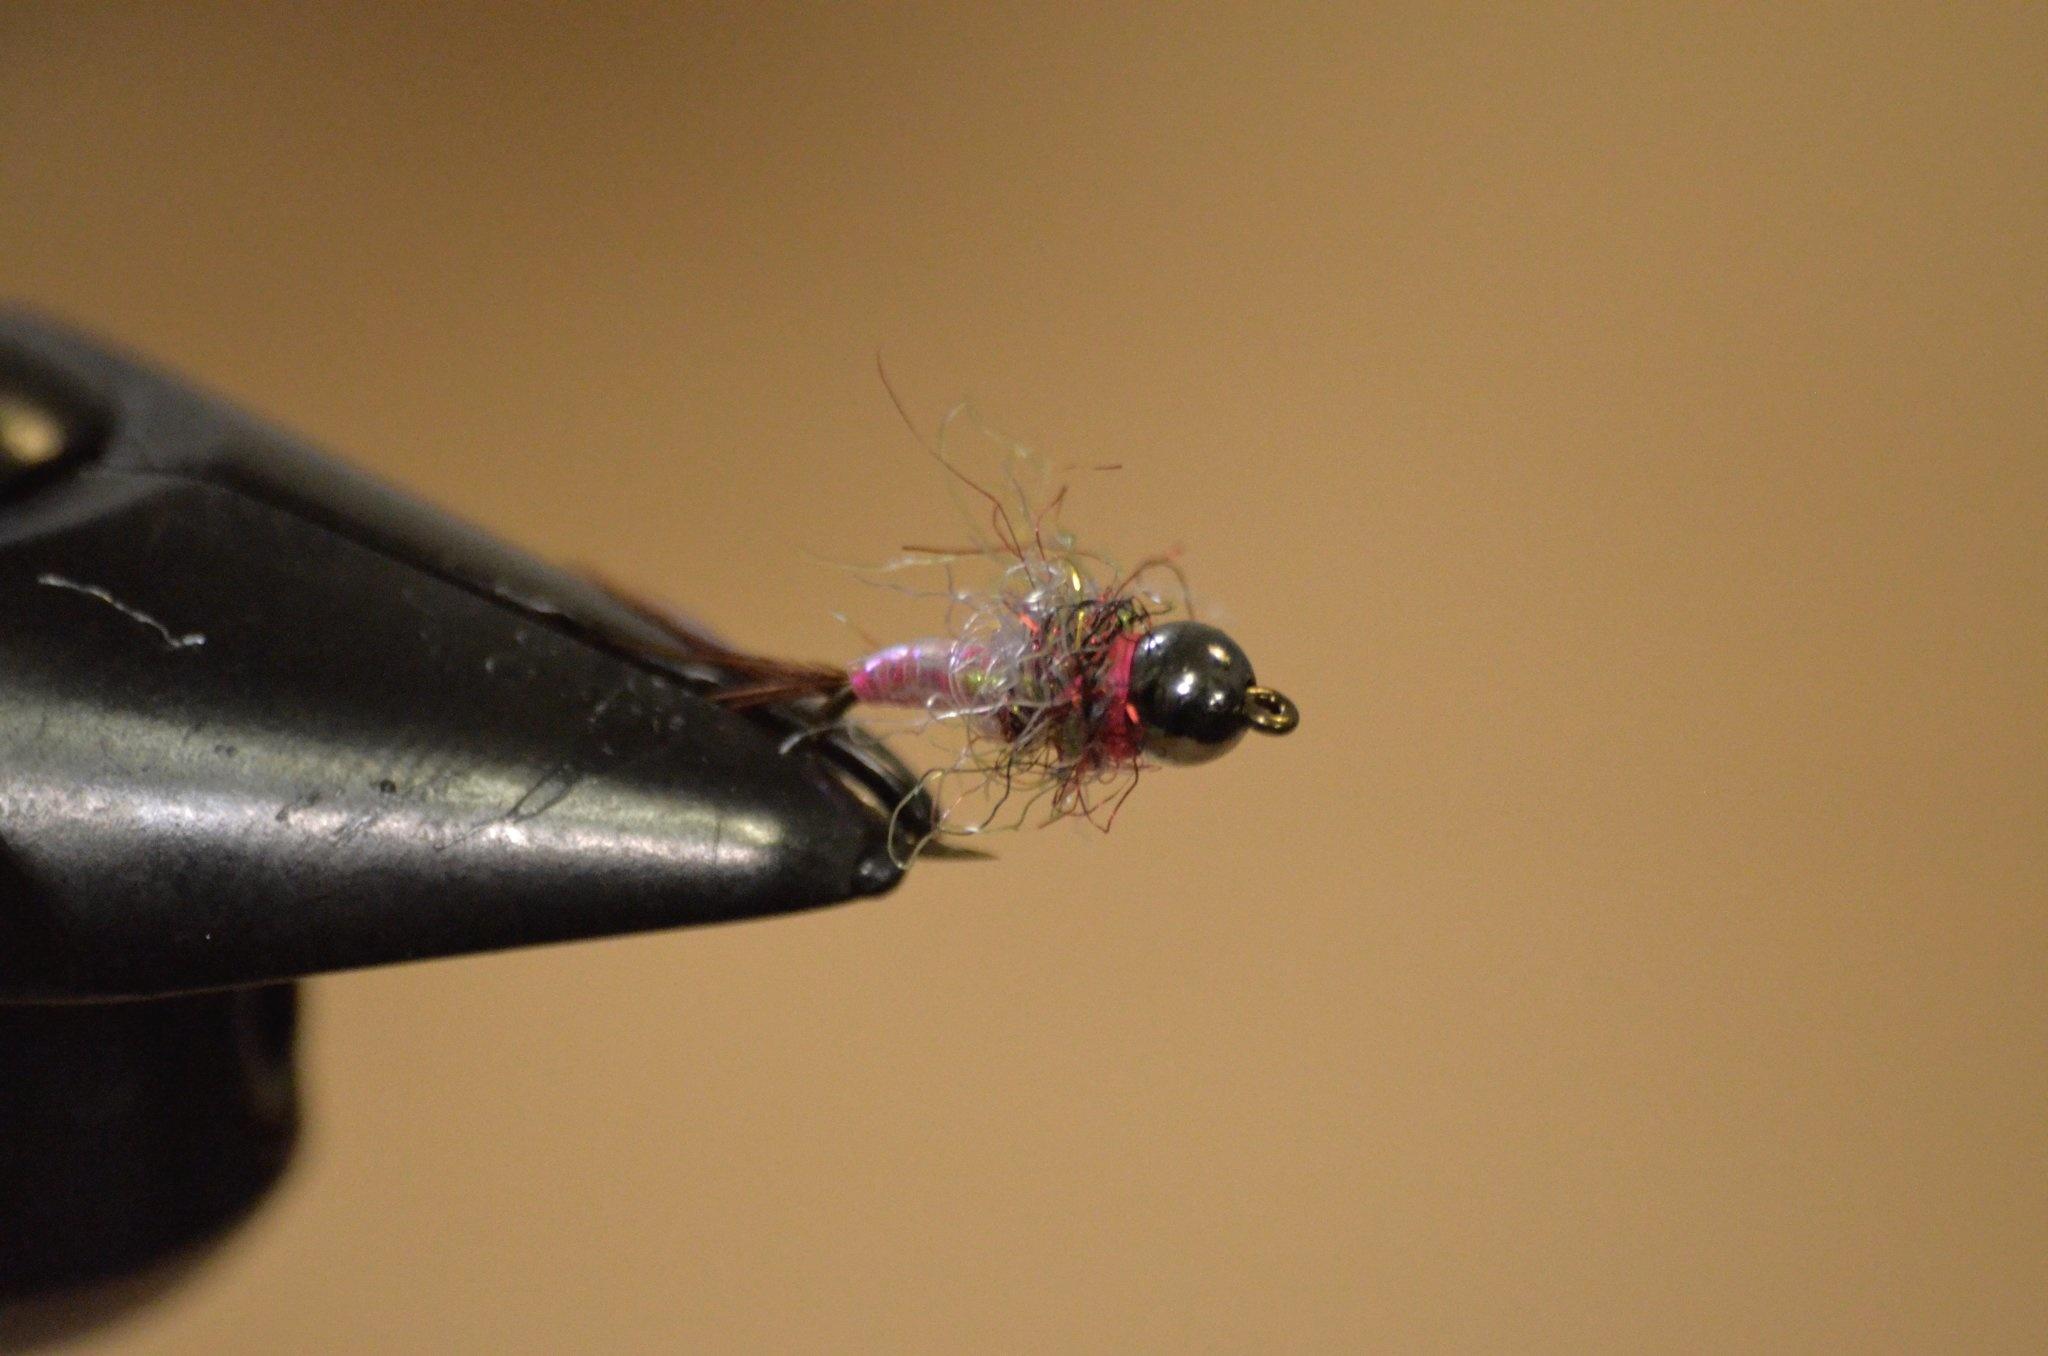 Urban Angler Fly Tying Kit - Rainbow Warrior